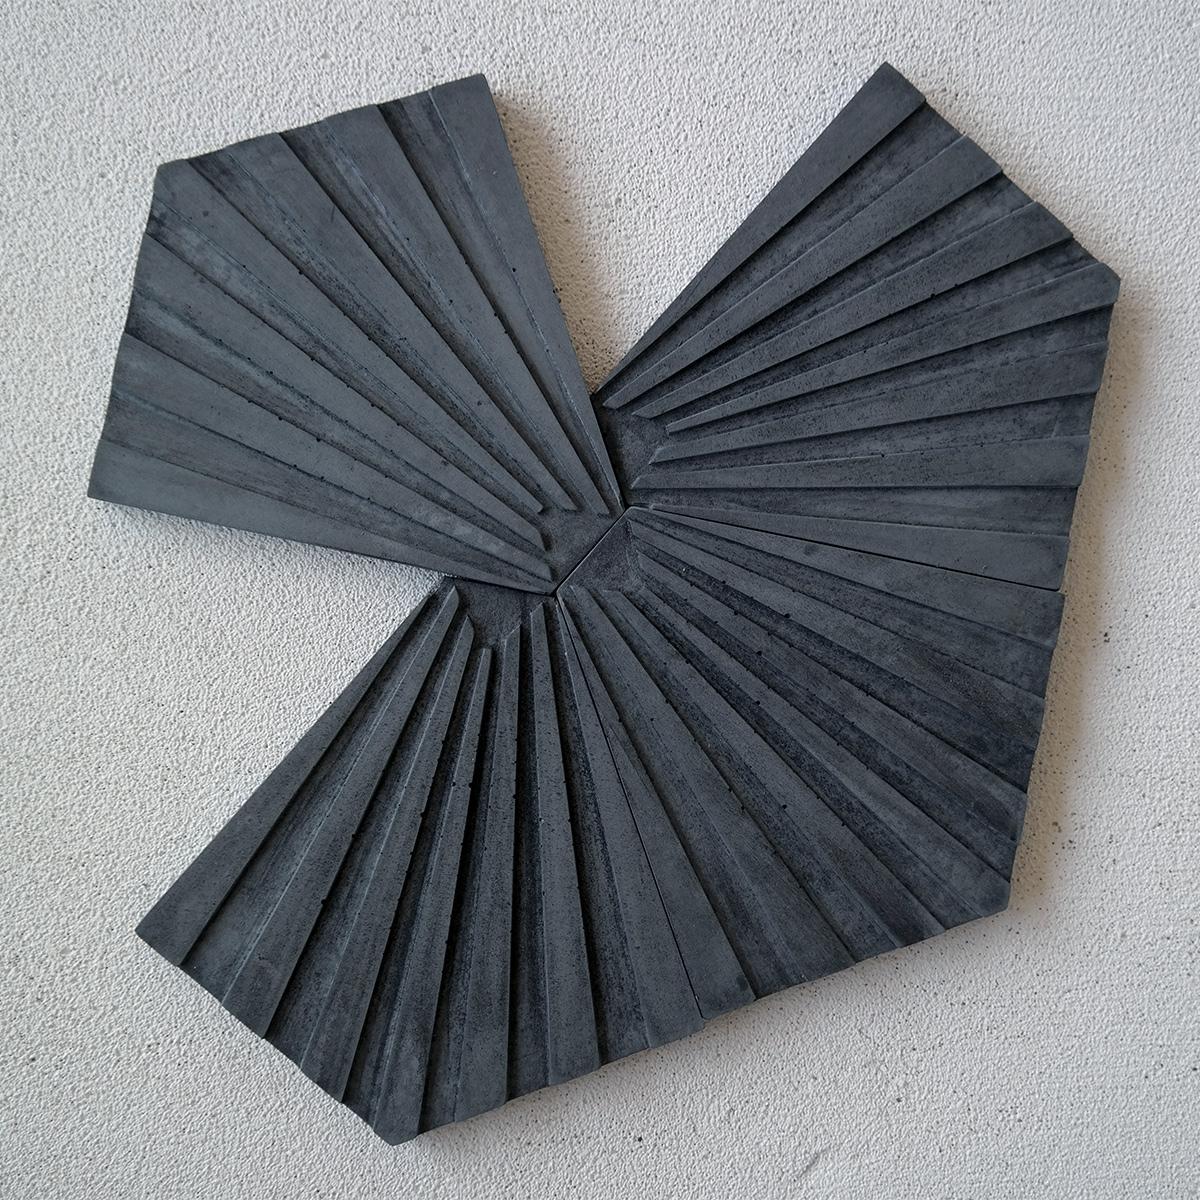 MODI-beton-onderzetters-vorm-antra